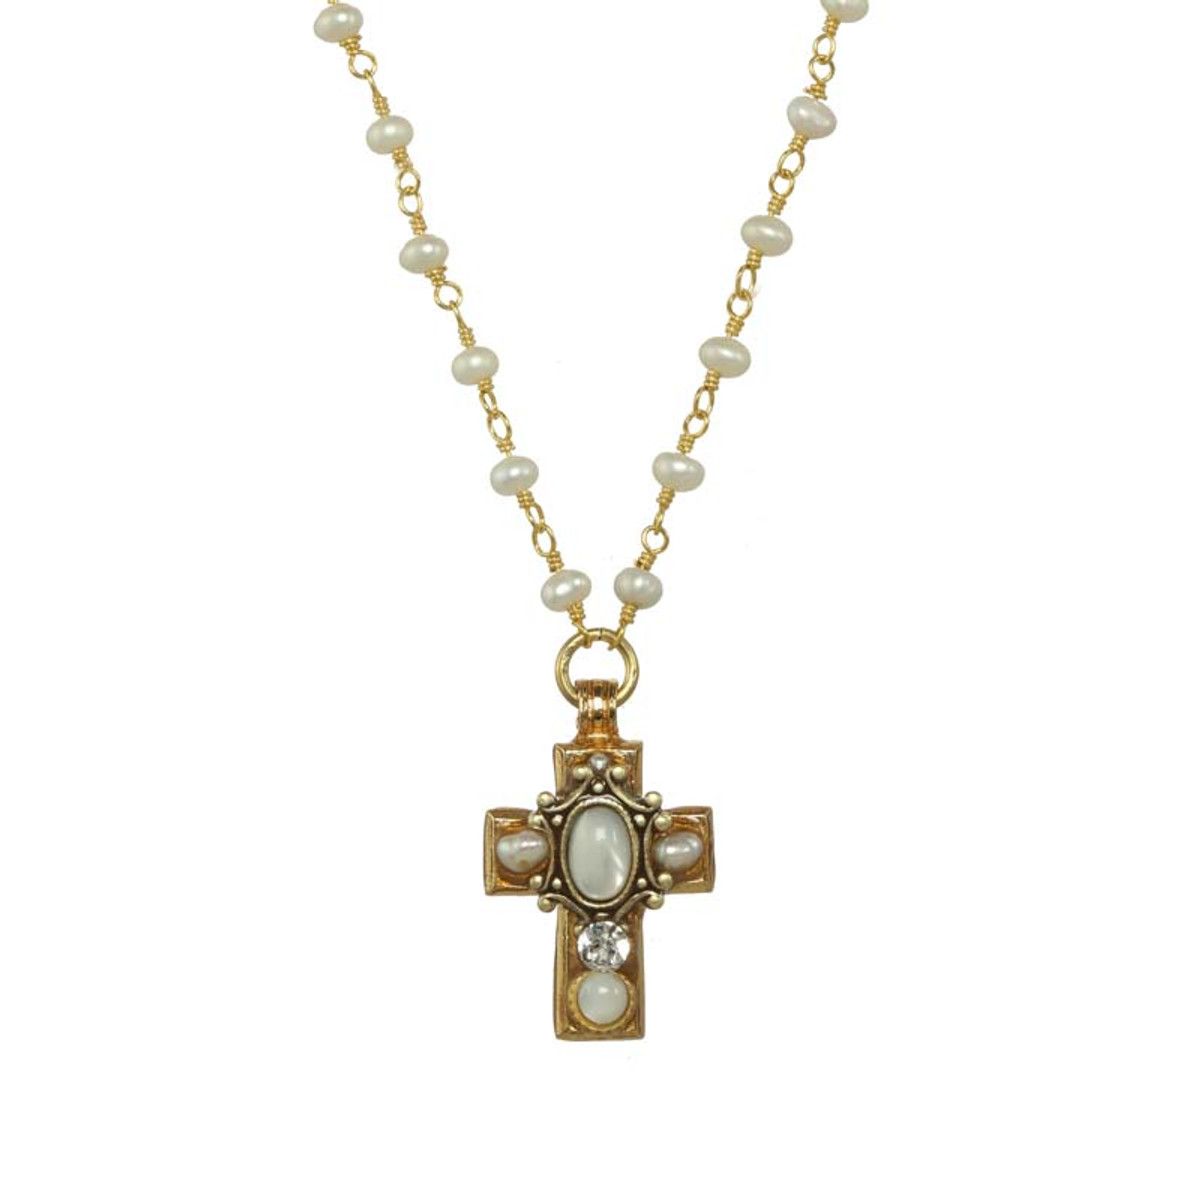 Michal Golan Jewelry Elegante White Necklace